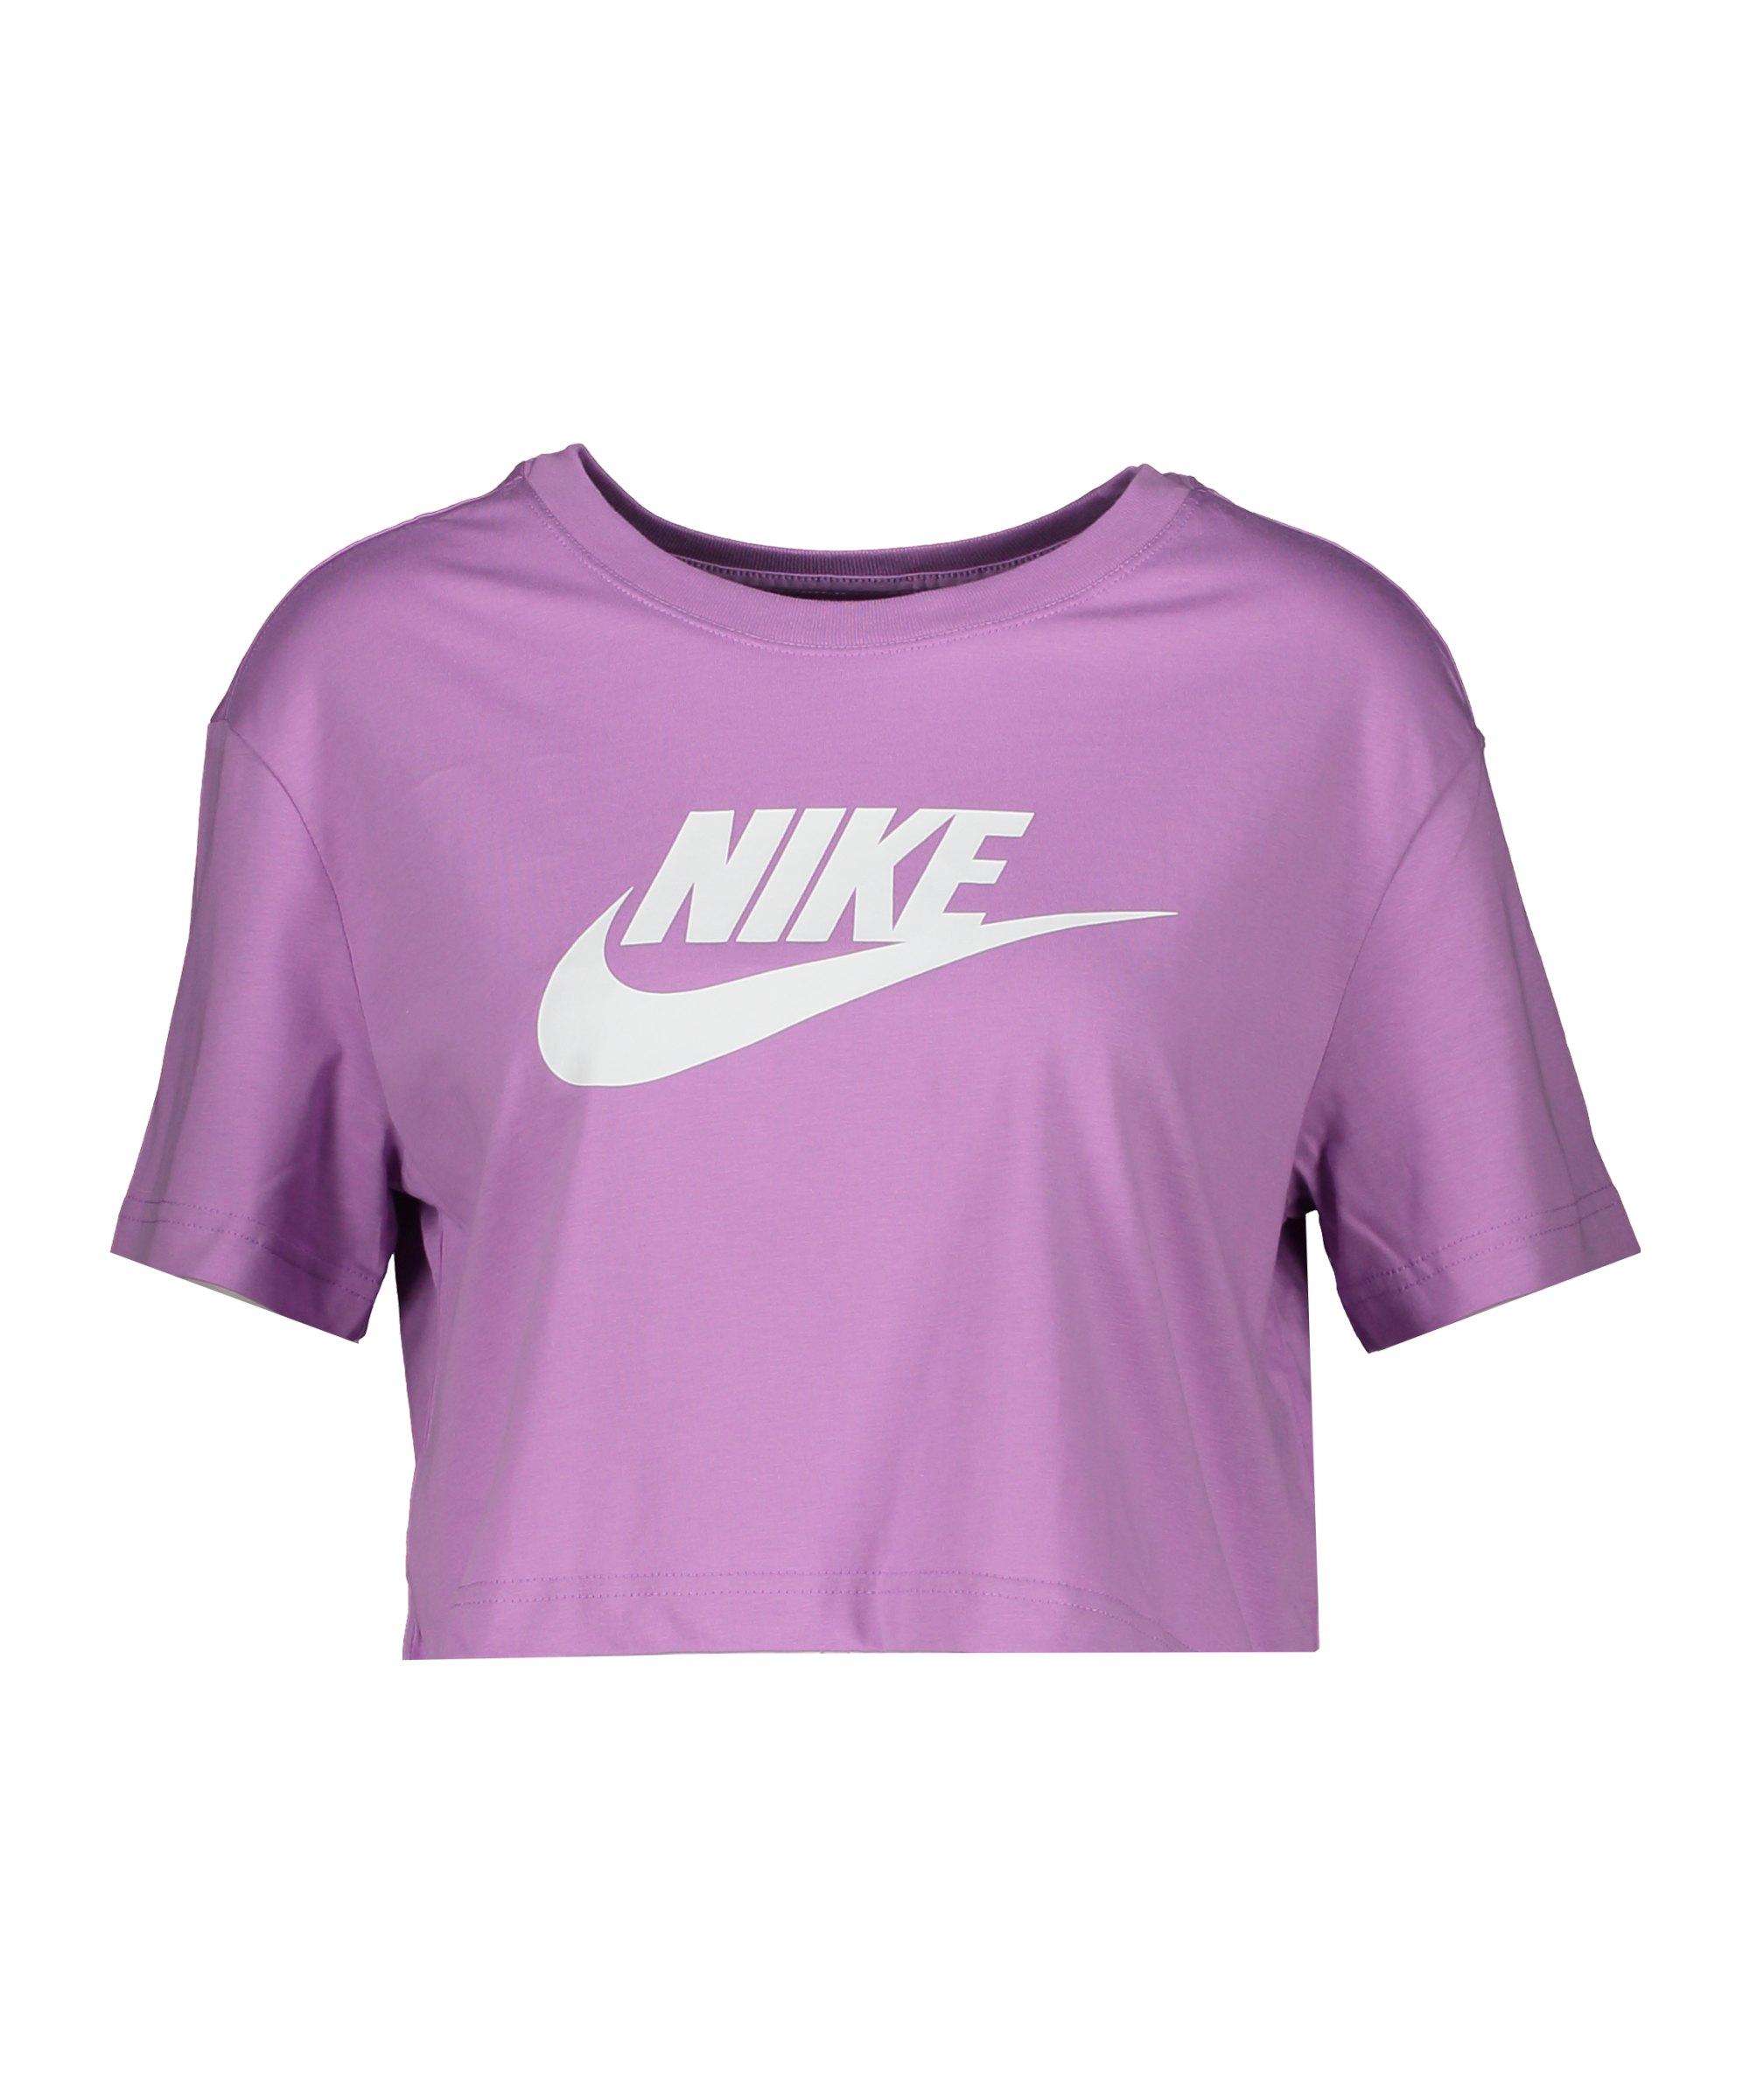 Nike Essentials Cropped T-Shirt Damen Lila F591 - lila